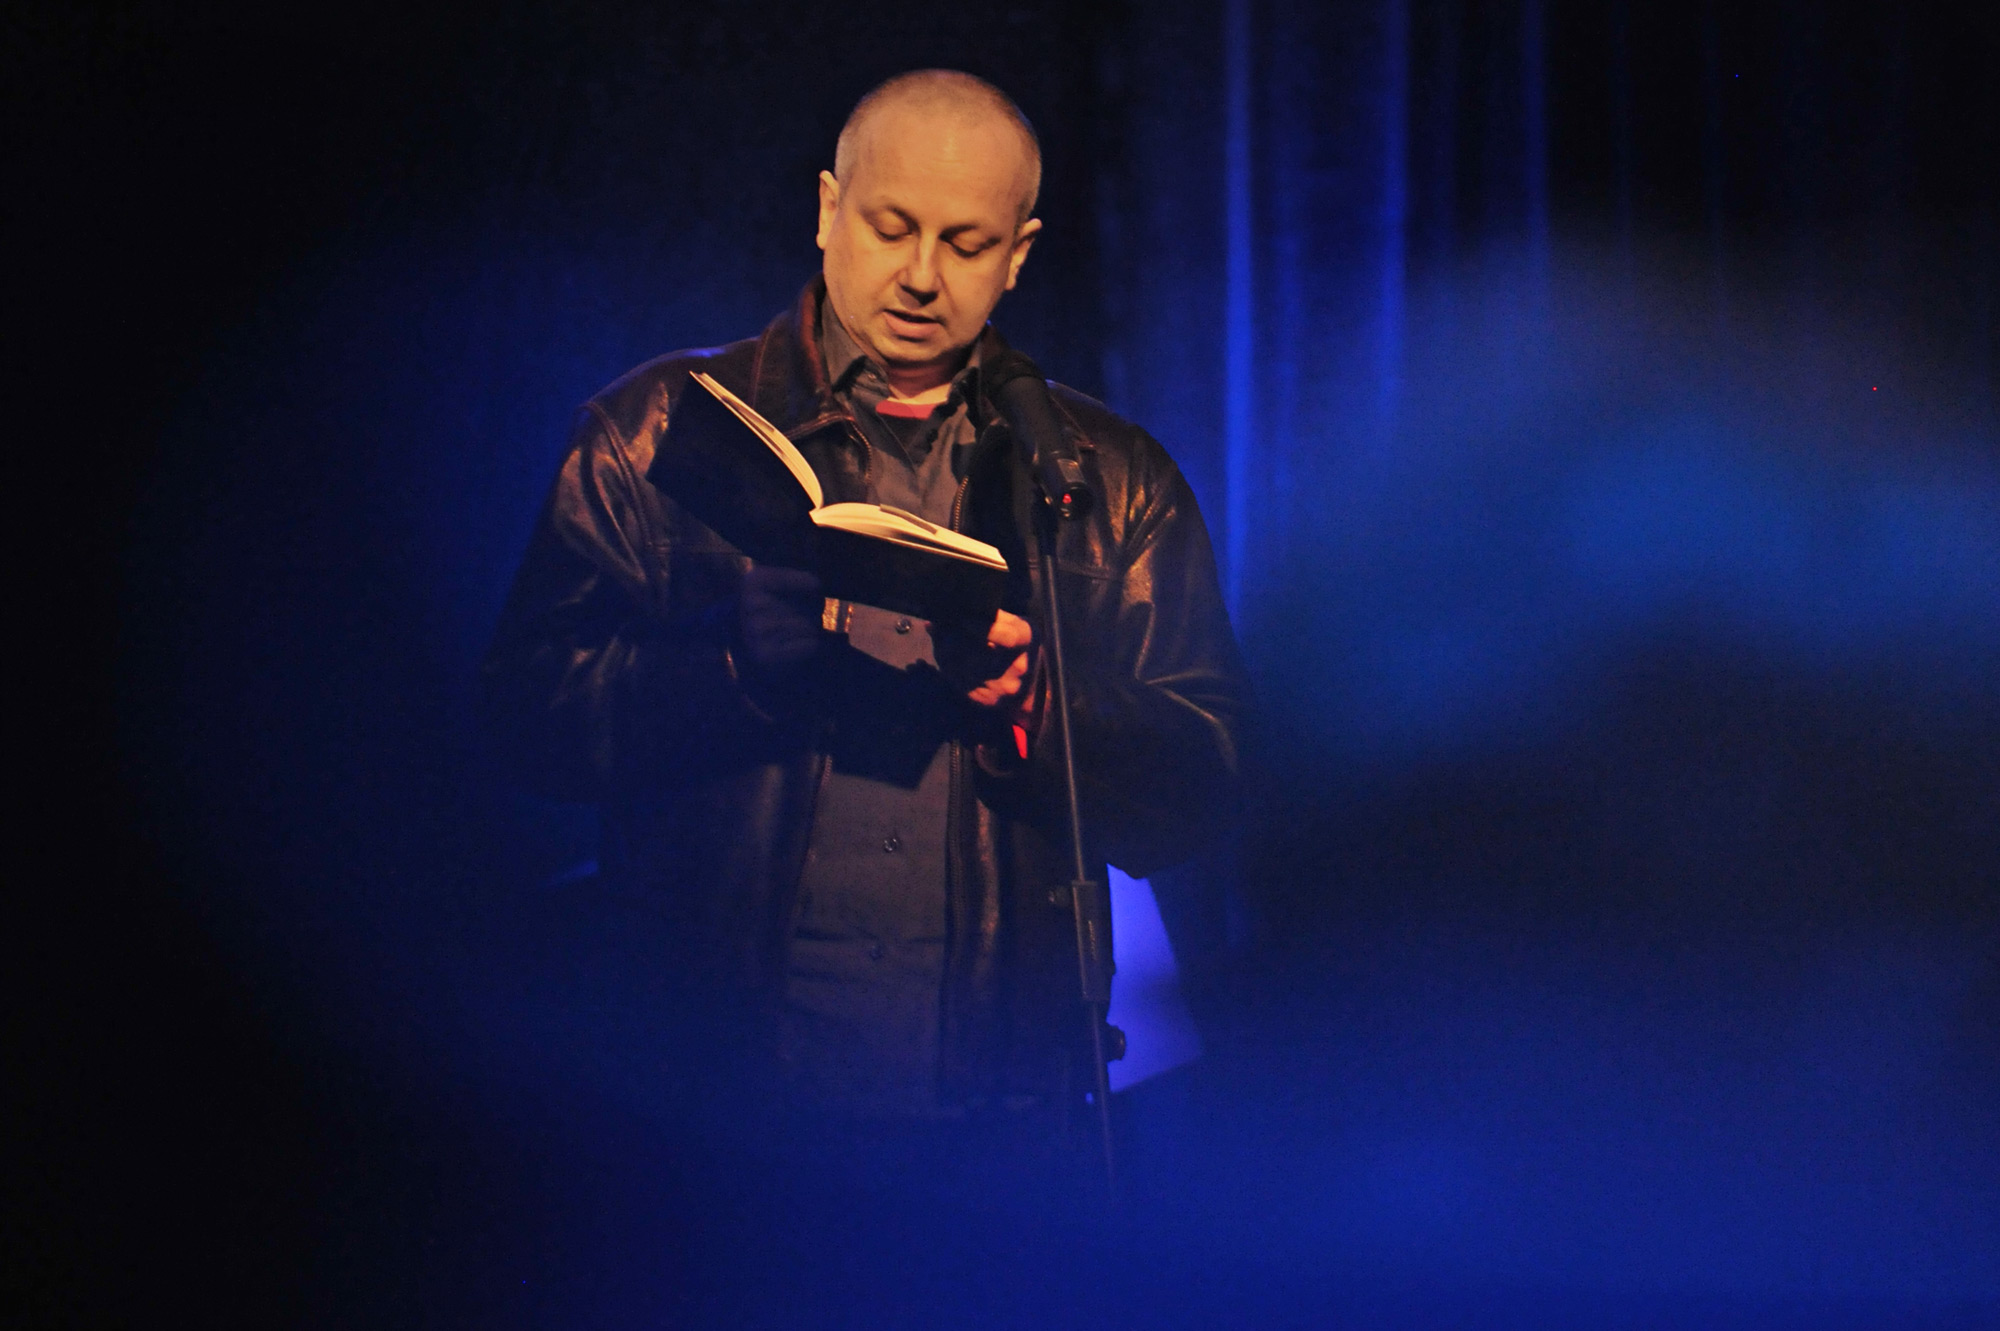 Jaworski, Krzysztof portréja